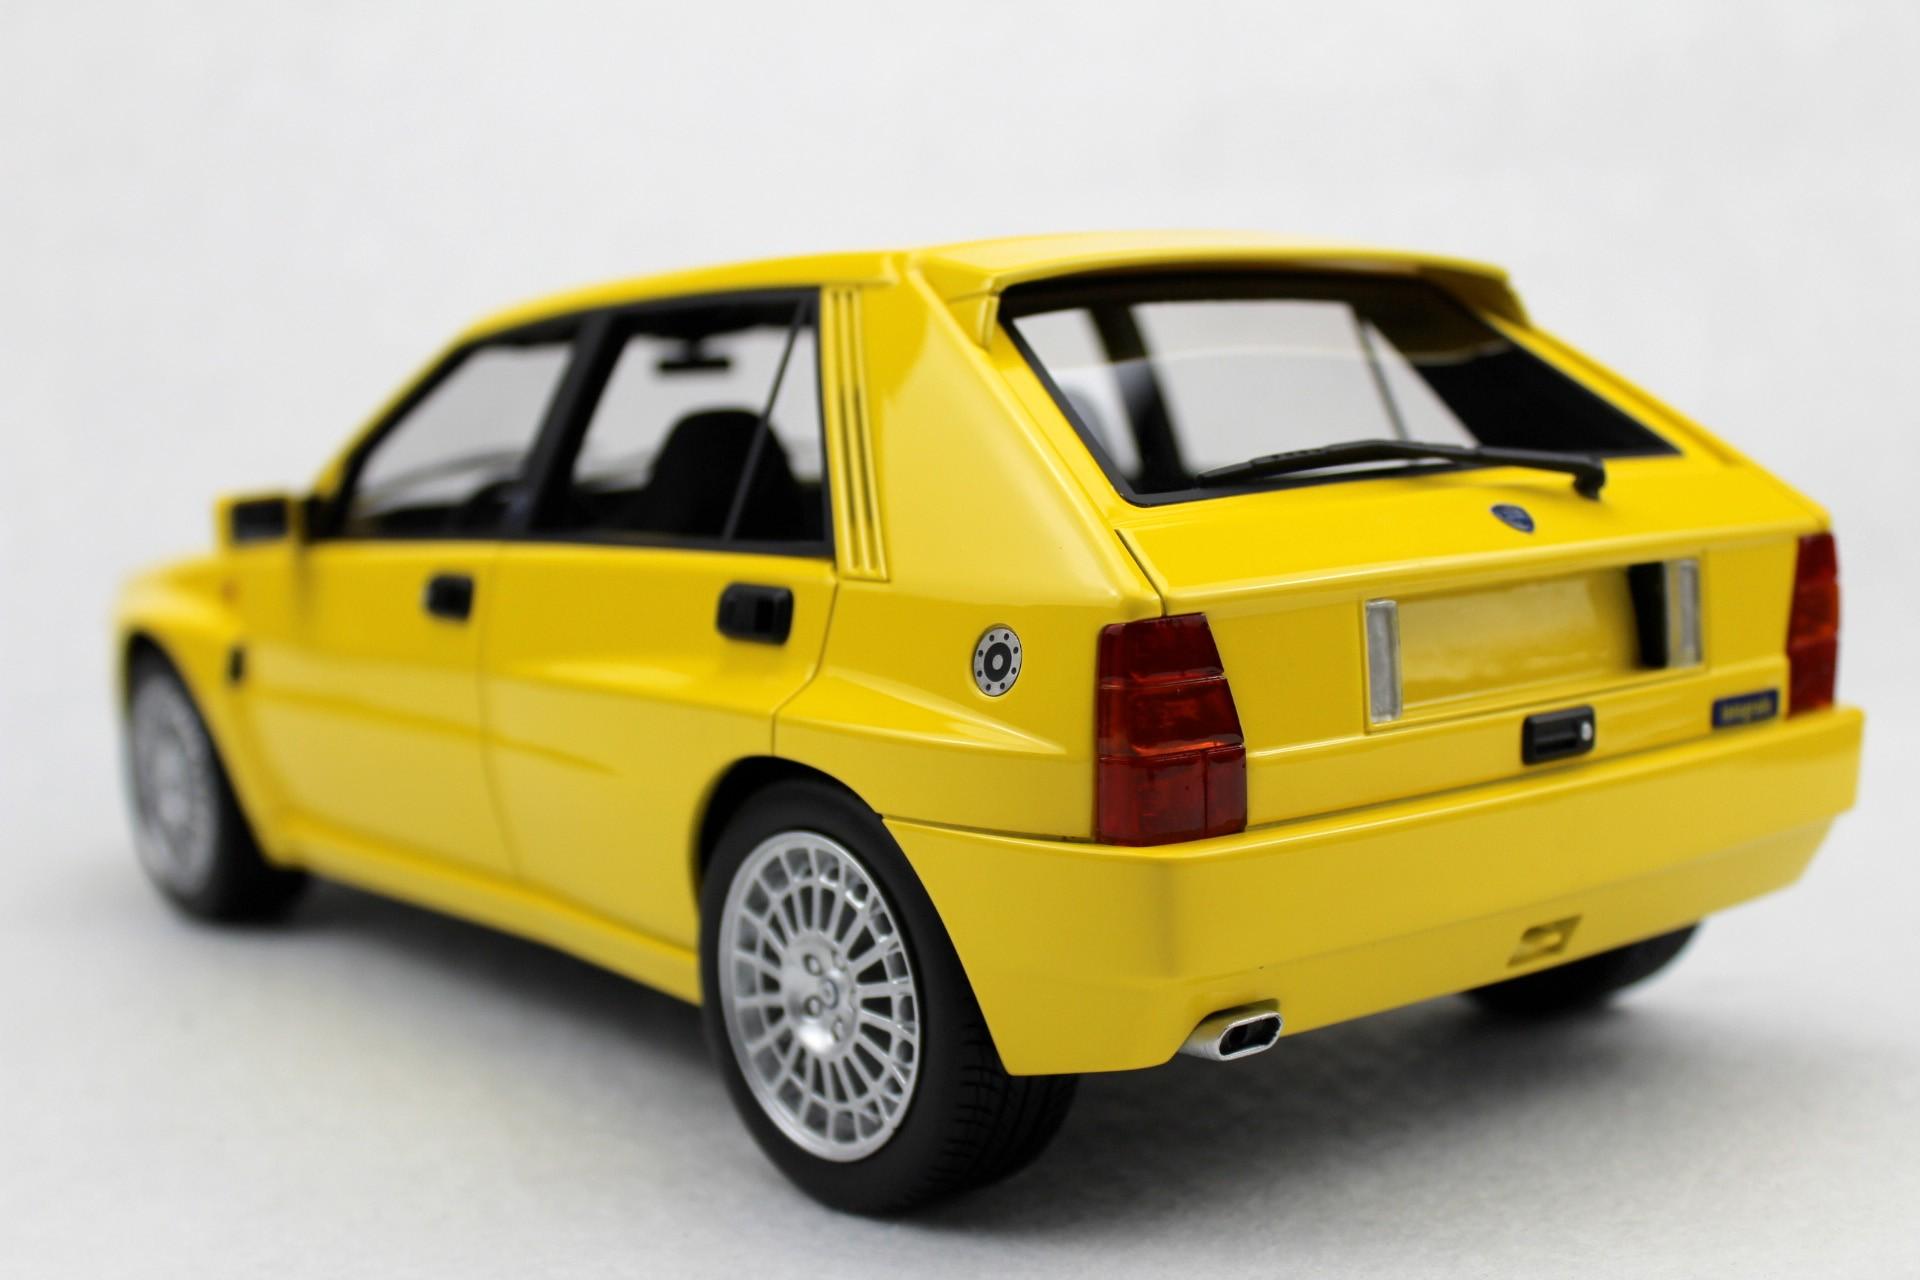 Top Marques Collectibles Lancia Delta Integrale Evolution